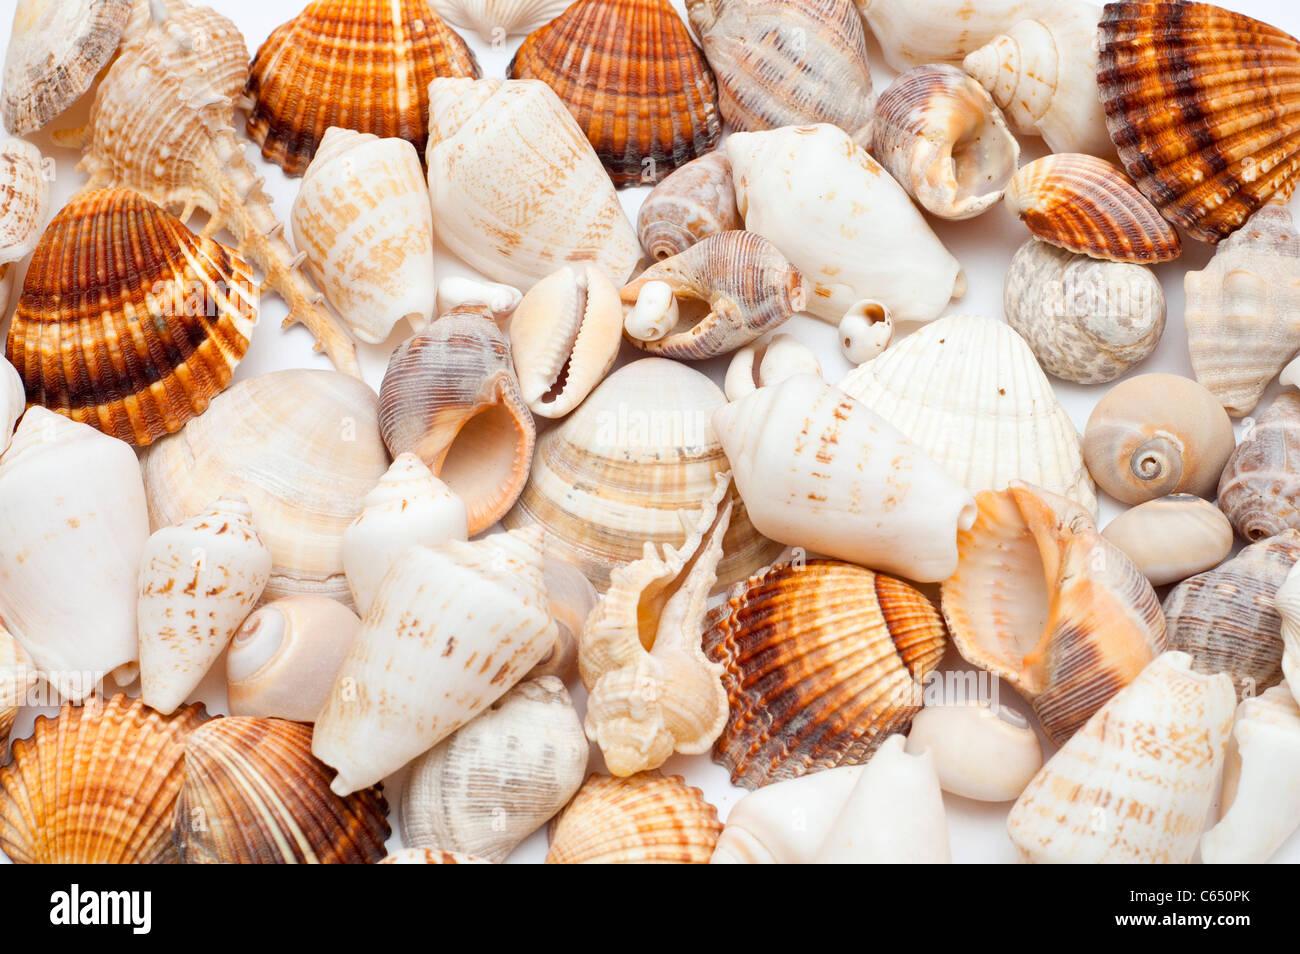 background of assorted seashells stock photo royalty free image